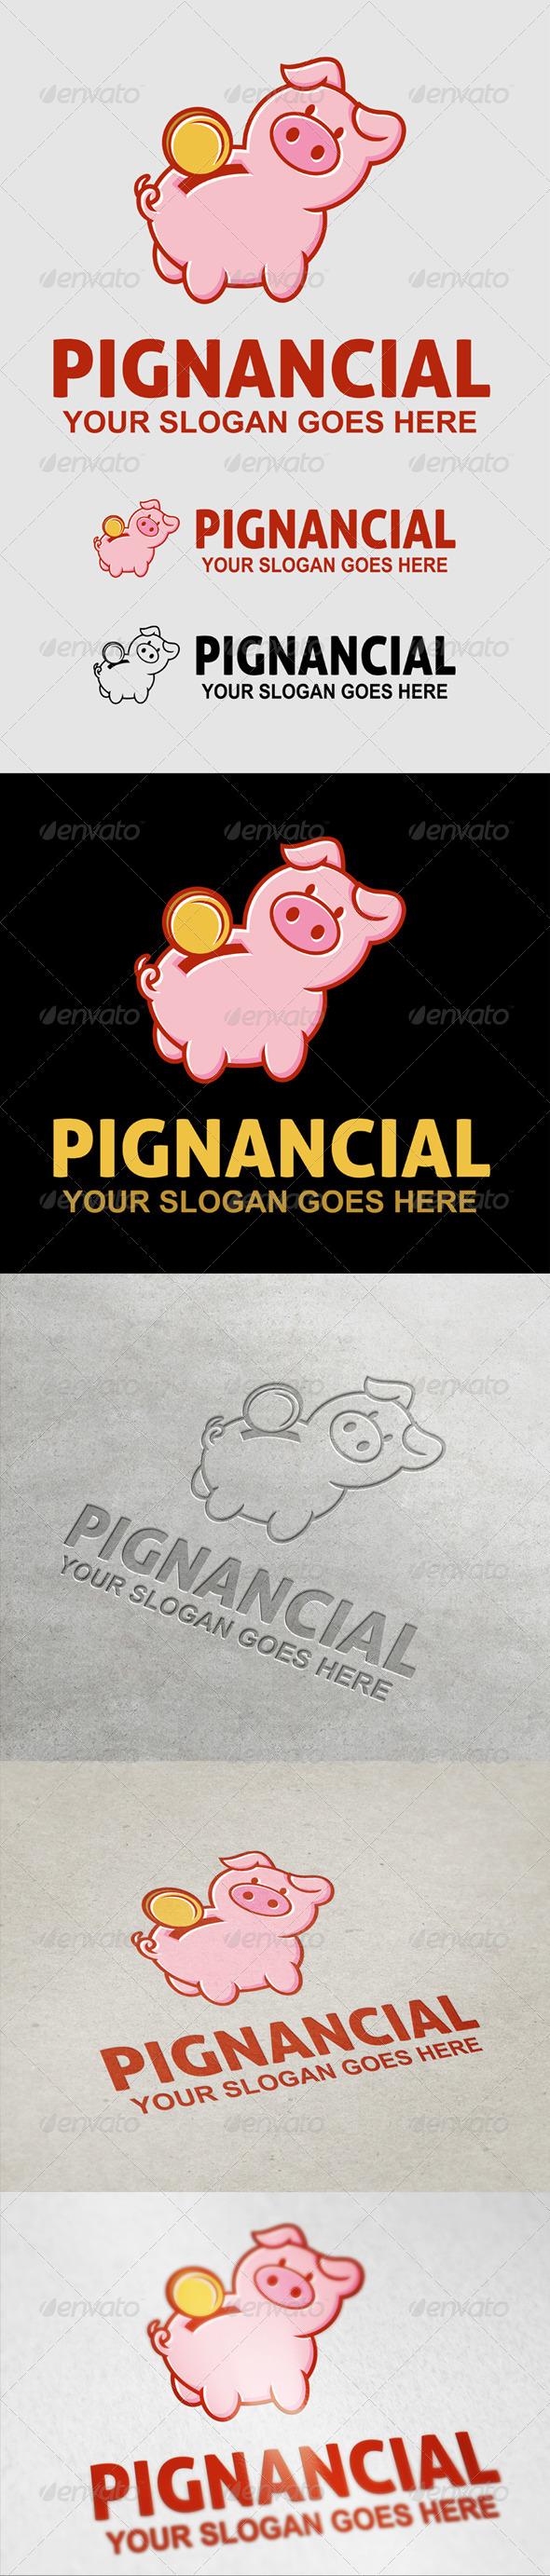 Pignancial Logo - Animals Logo Templates